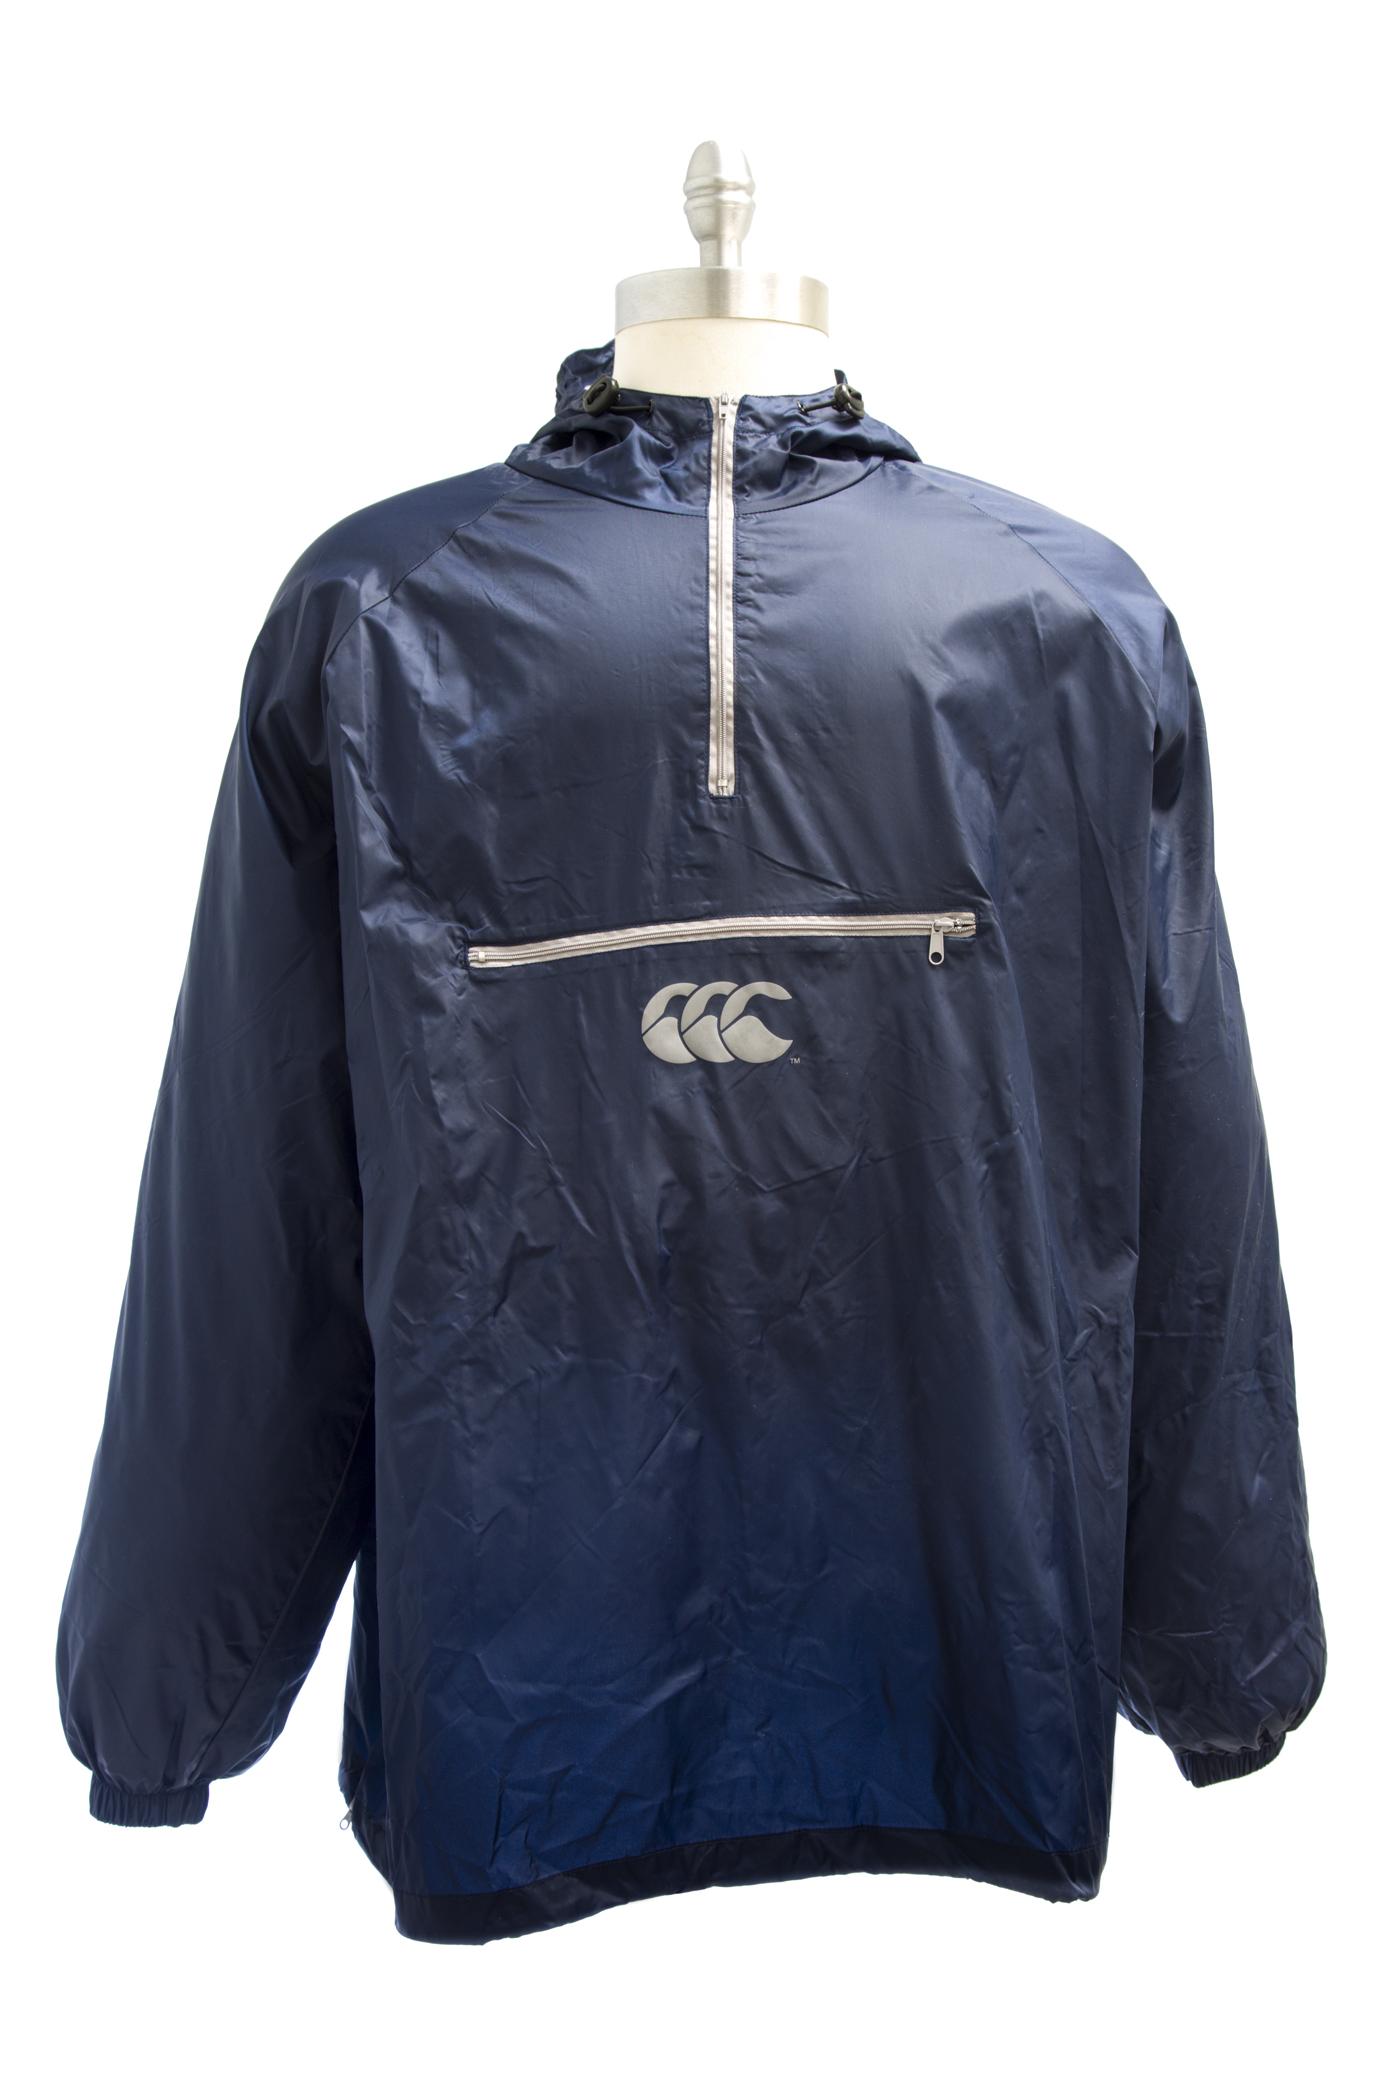 Canterbury of New Zealand Navy Blue Half Zip Windbreaker Jacket F58188 $98 NEW